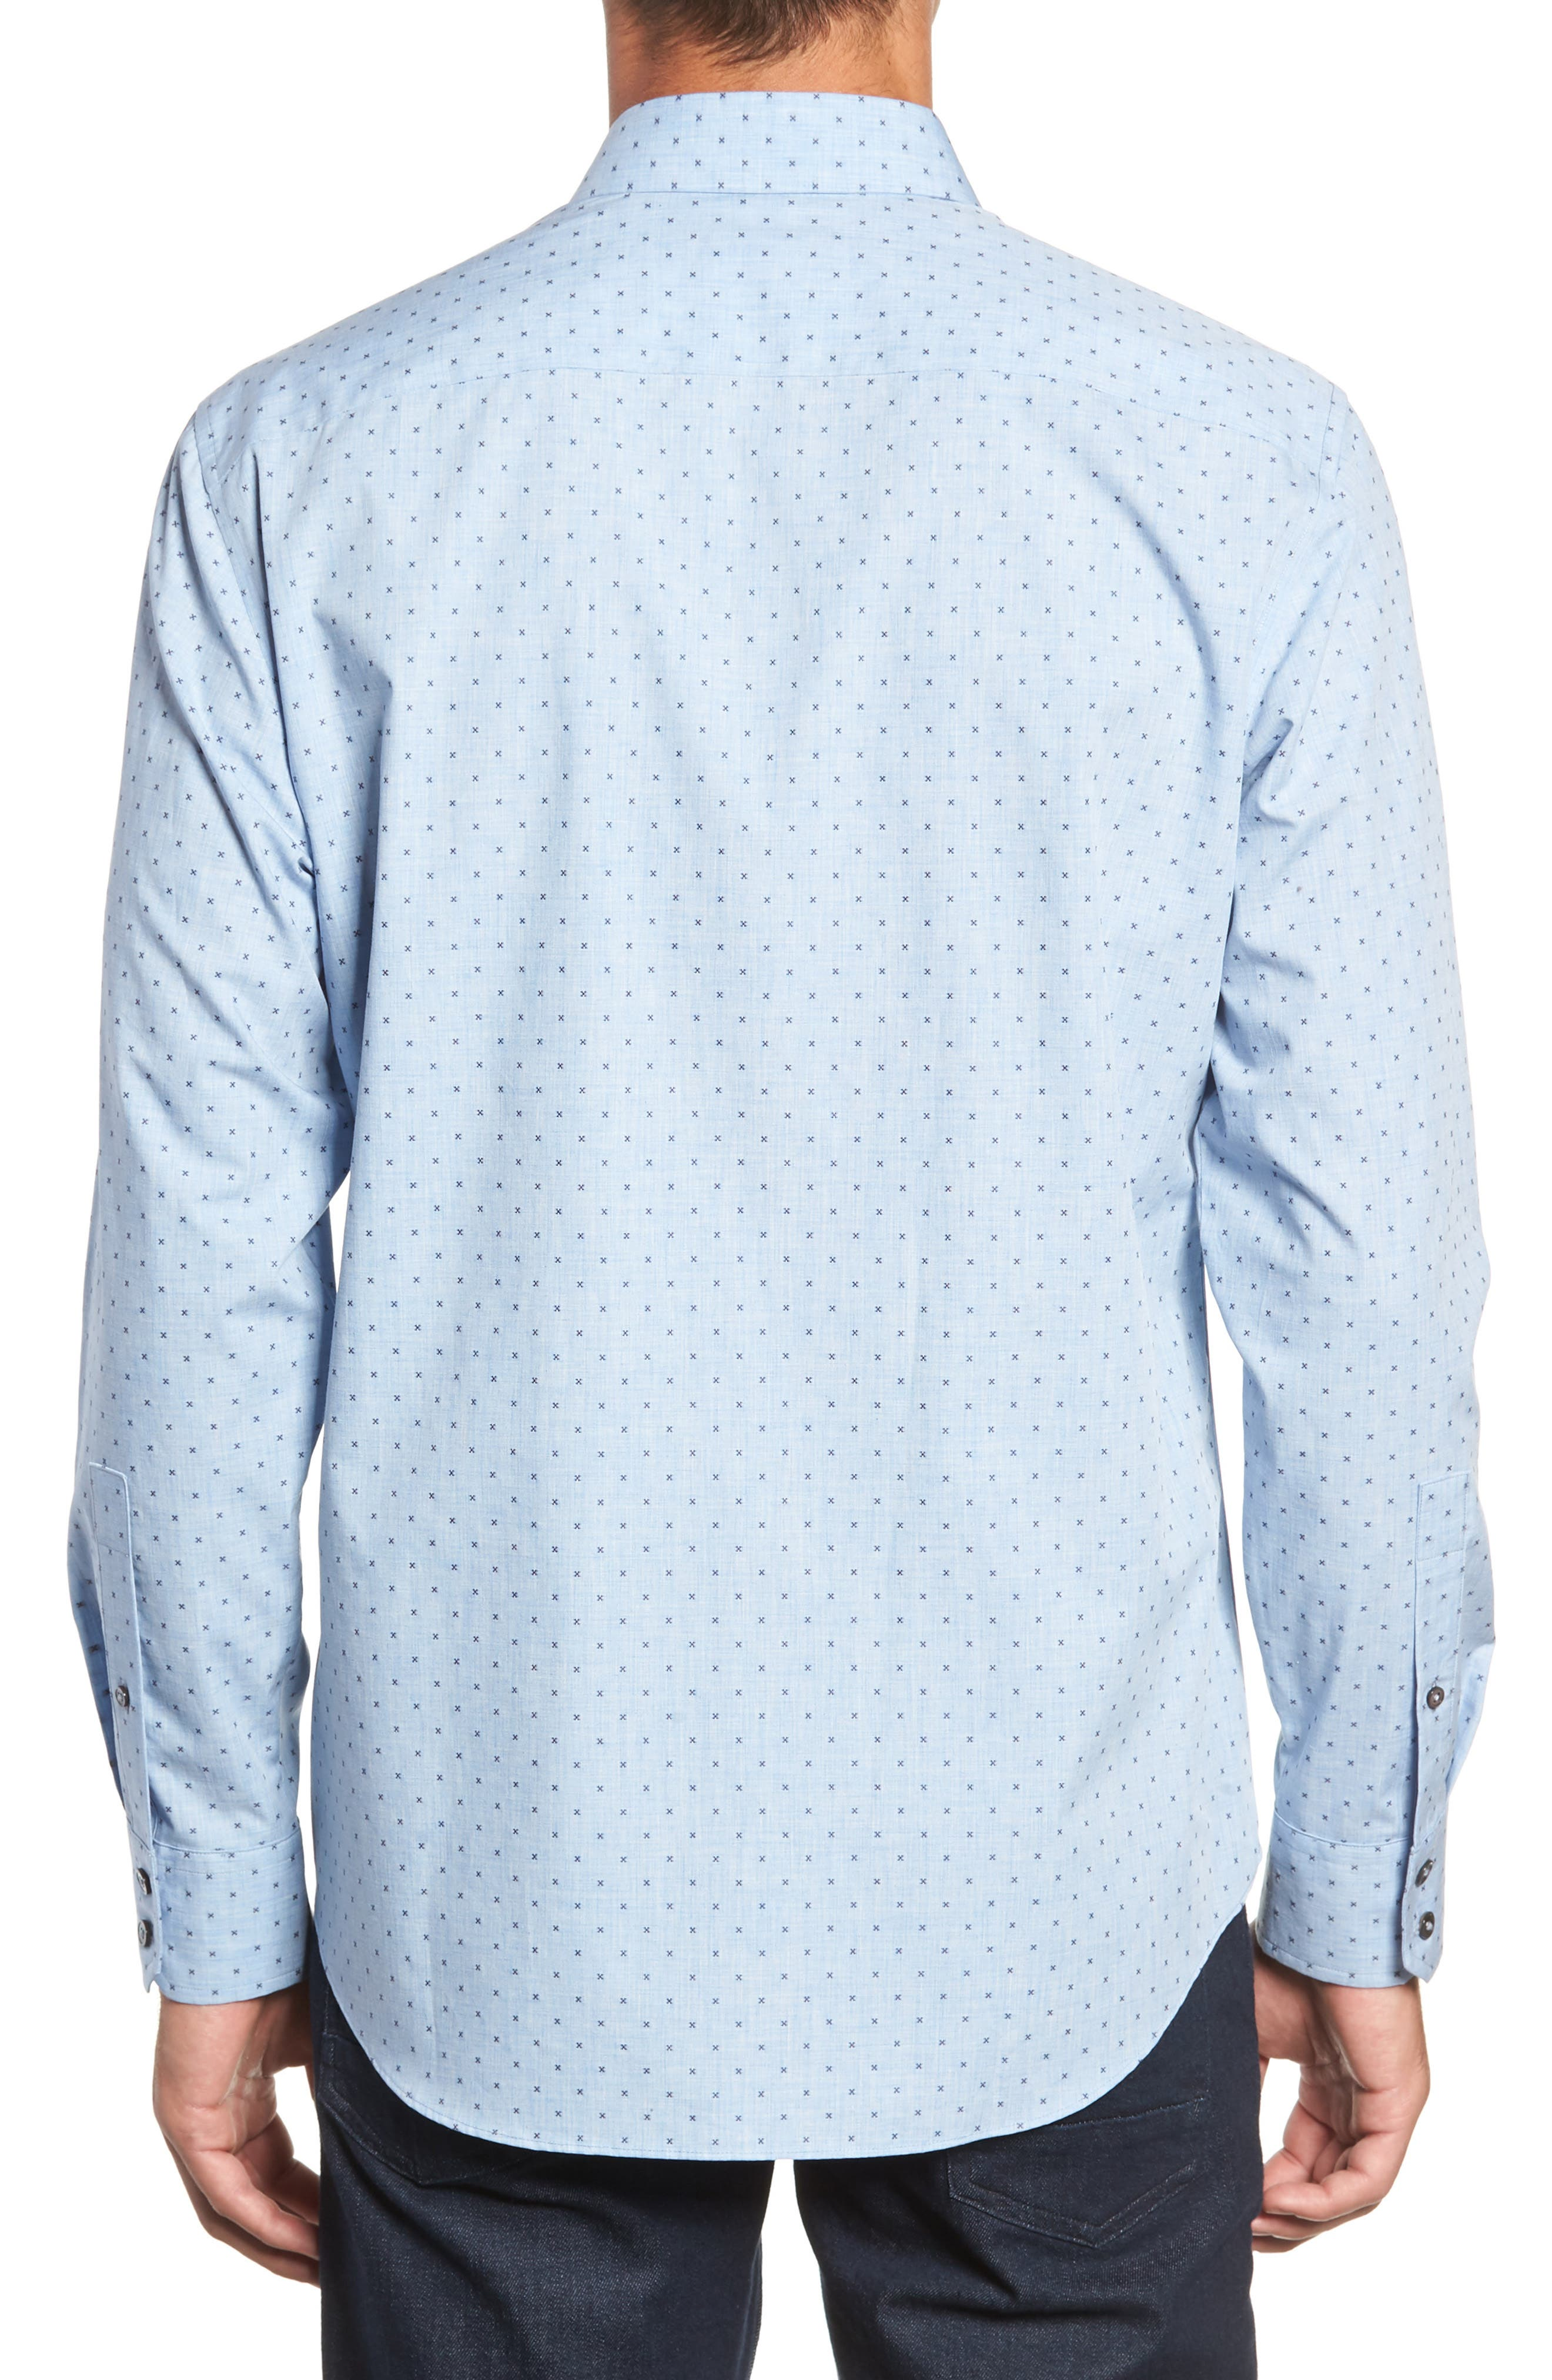 ZACHARY PRELL,                             Zhang Regular Fit Sport Shirt,                             Alternate thumbnail 3, color,                             LIGHT BLUE